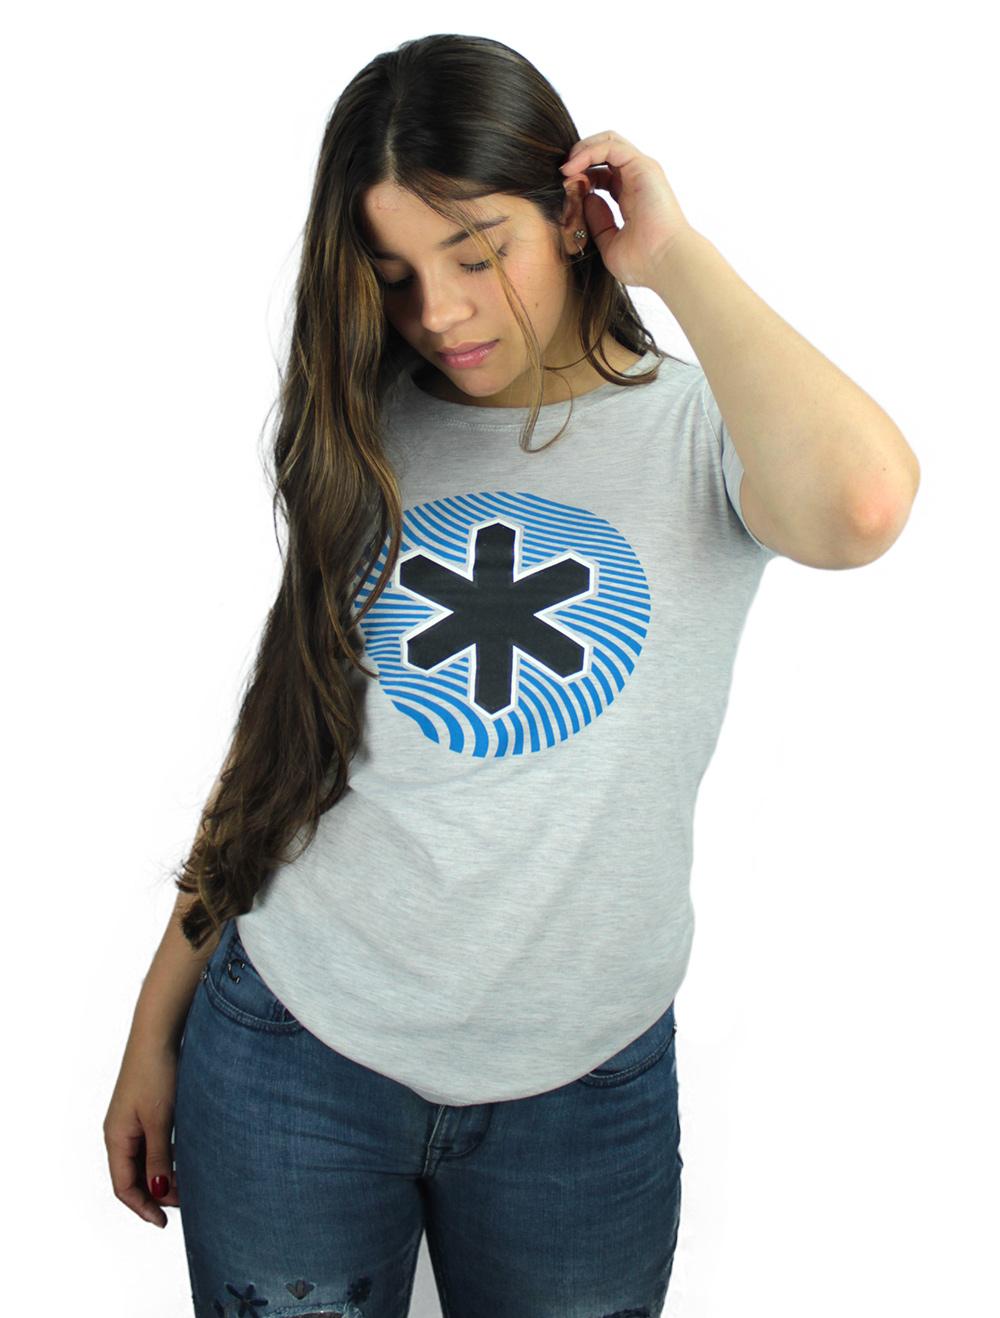 Camiseta Feminina Mescla Logo Azul e Preto